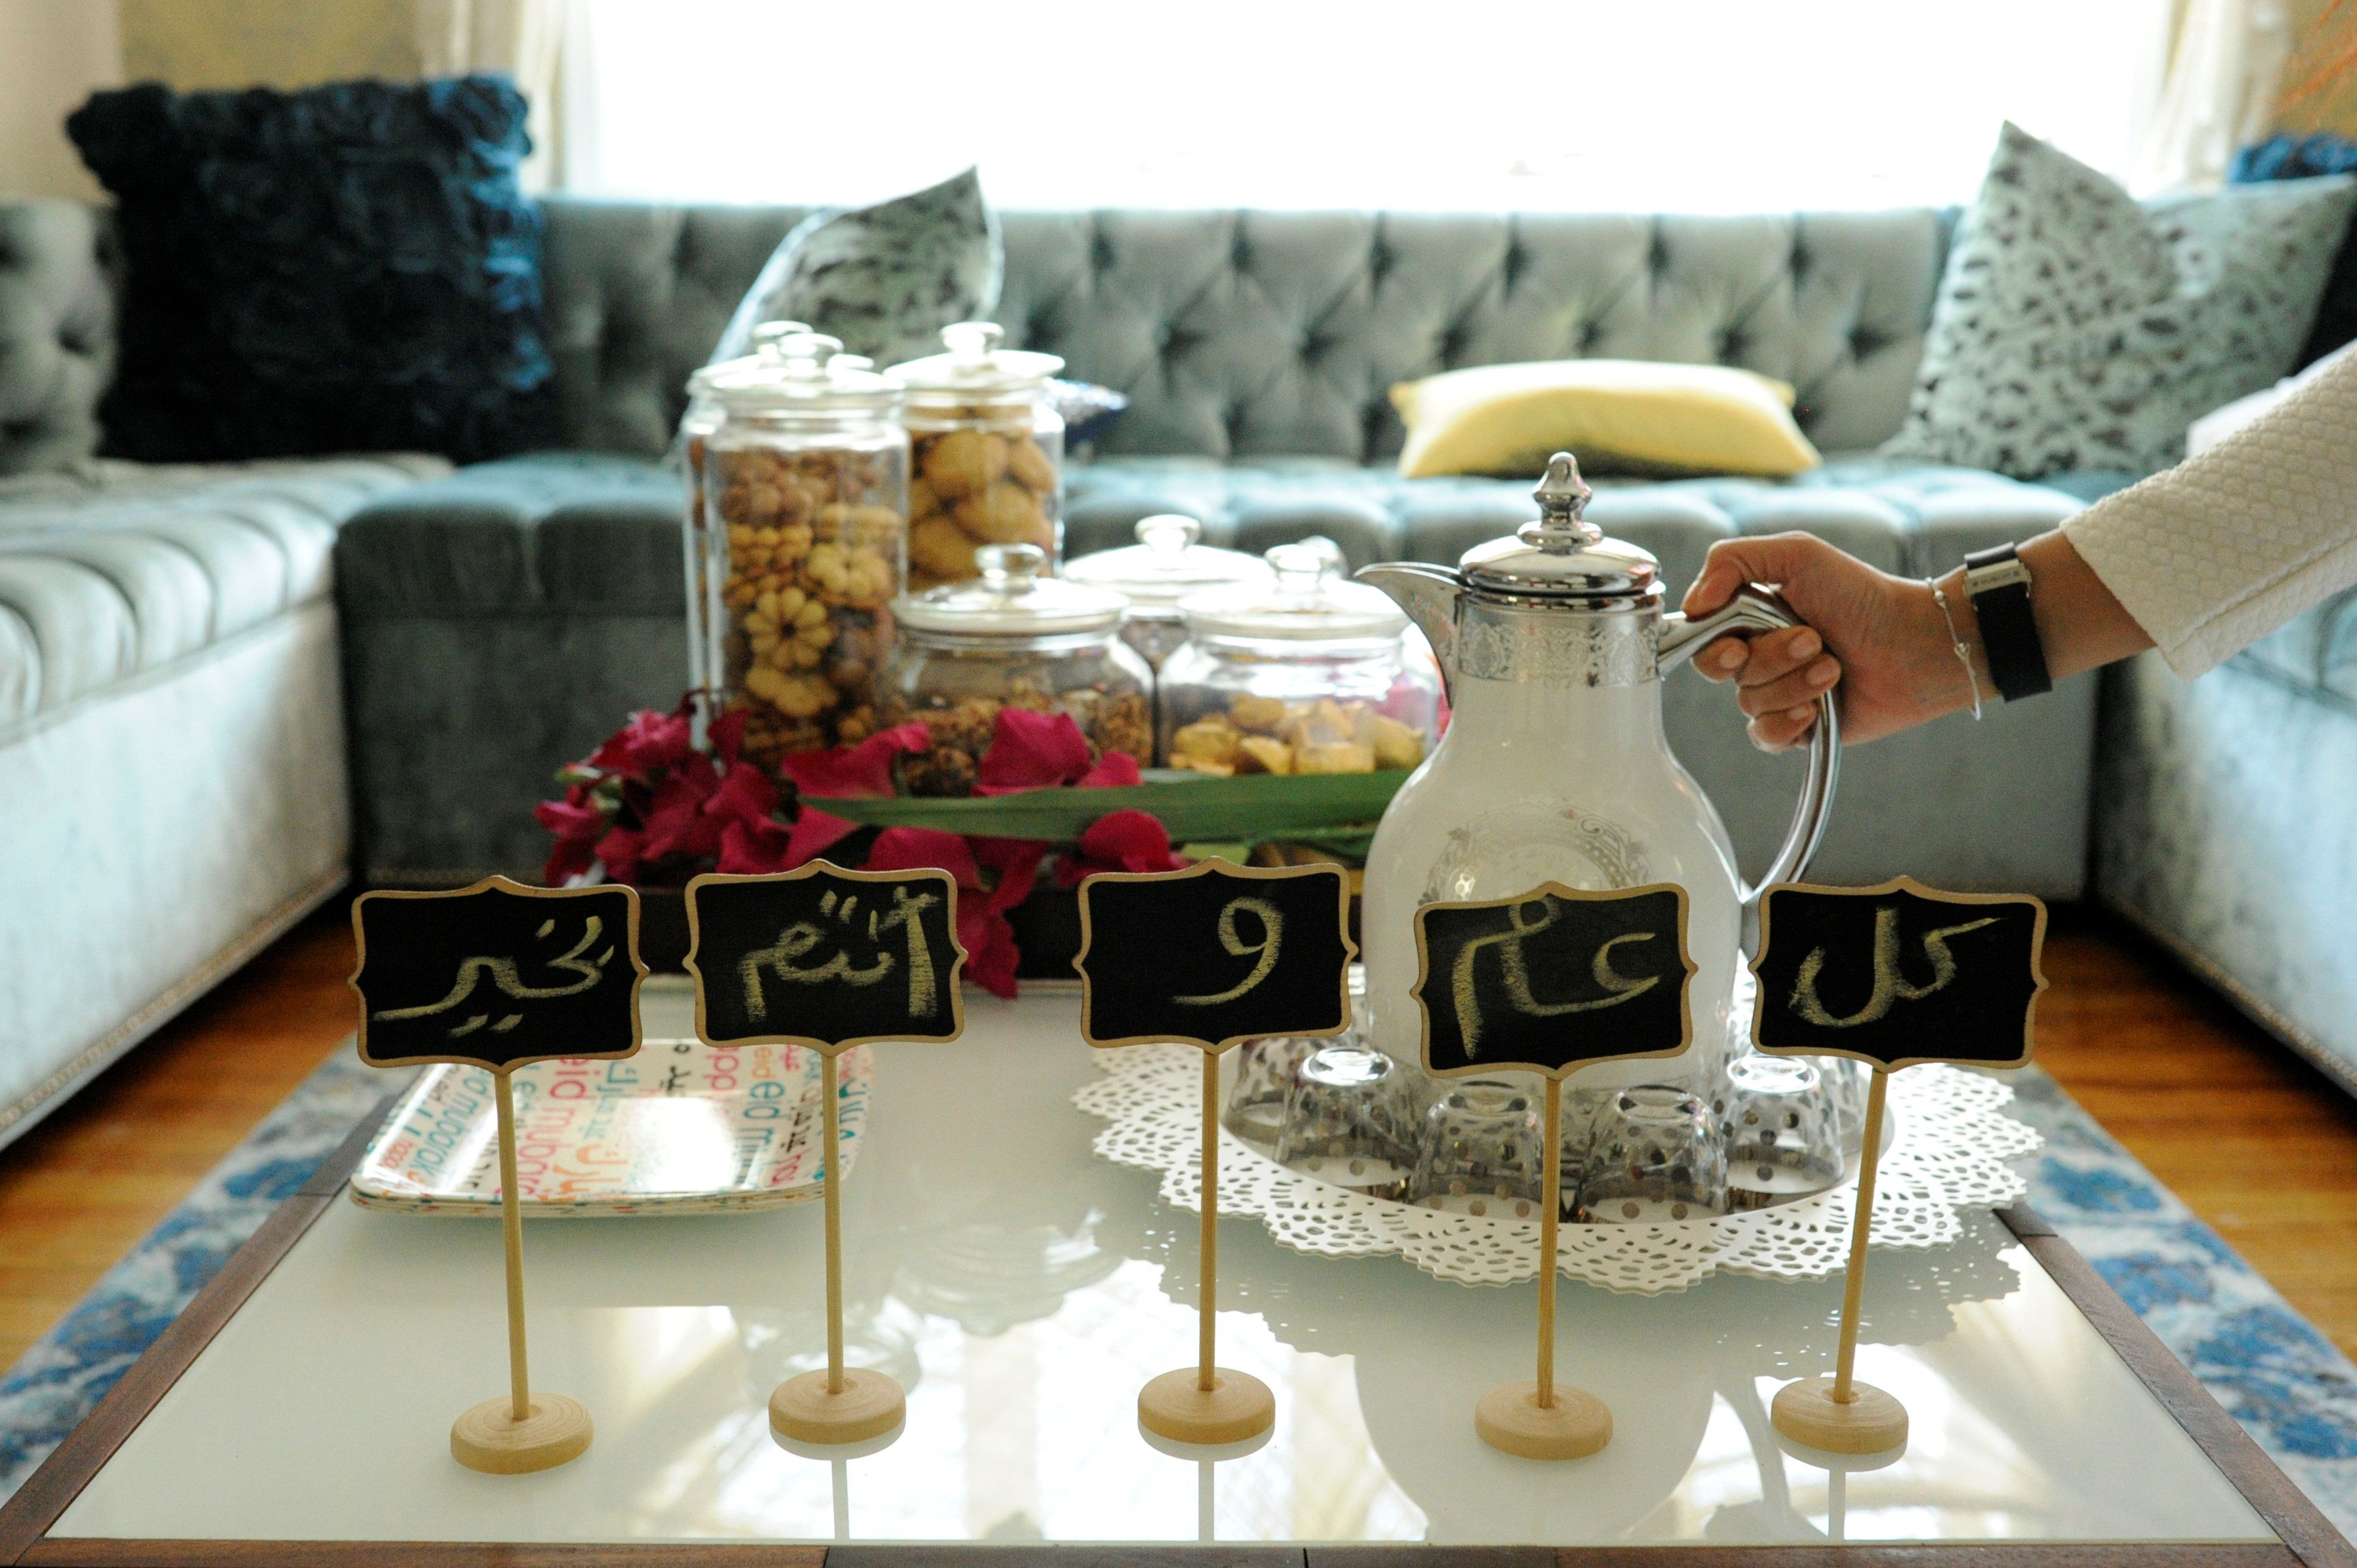 Most Inspiring Idul Fitri Eid Al-Fitr Decorations - 5951140c1500004b1f900211  2018_258498 .jpeg?ops\u003dscalefit_960_noupscale